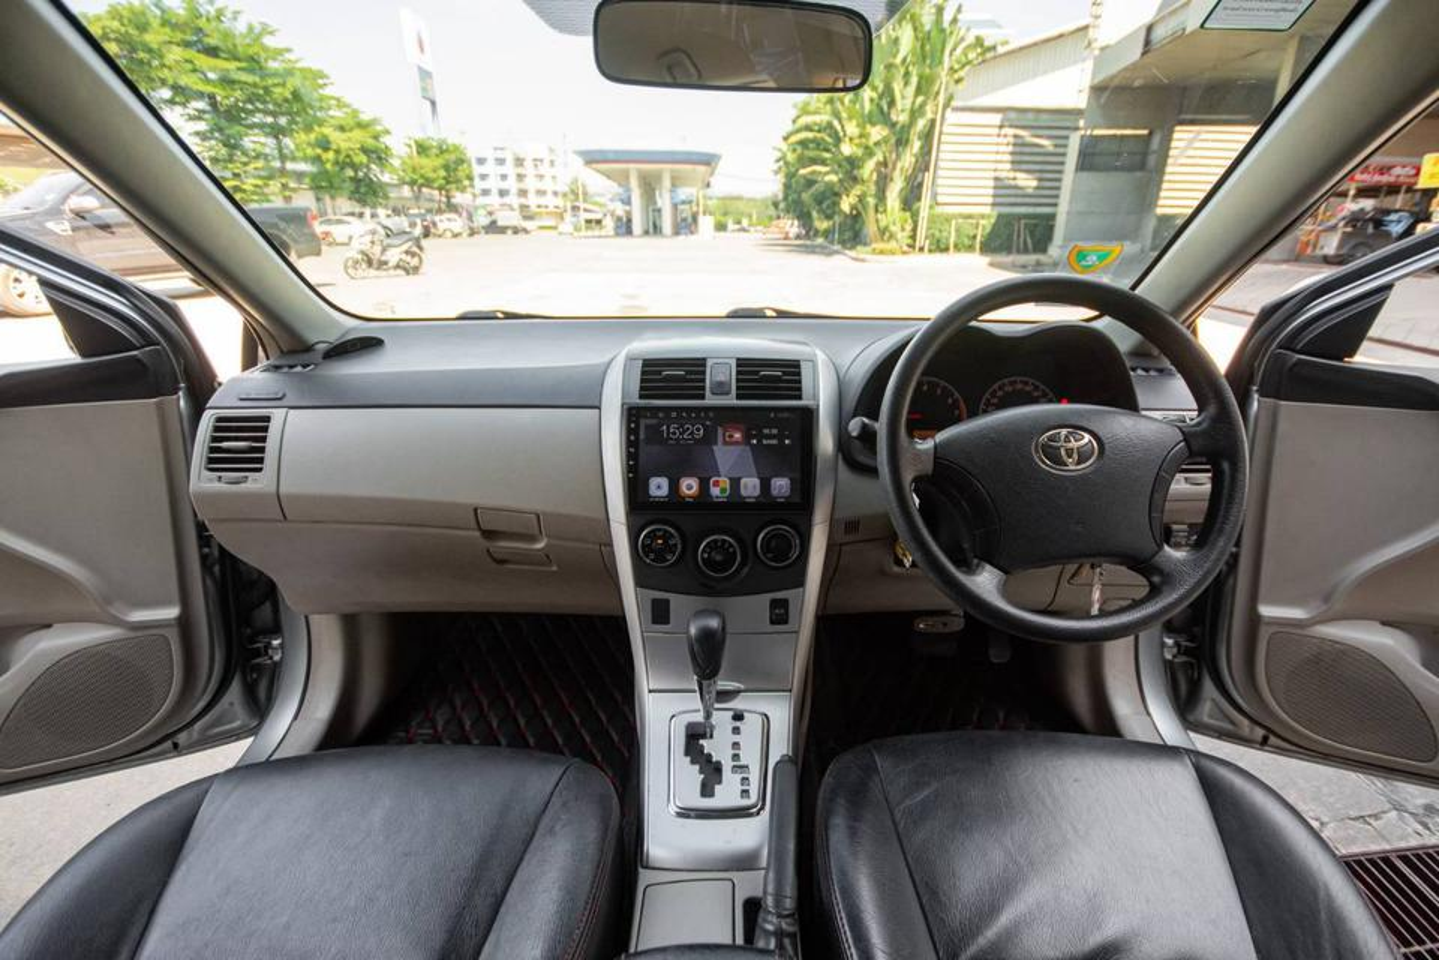 2011 Toyota Corolla Altis 1.6 (ปี 08-13) CNG Sedan รูปที่ 3